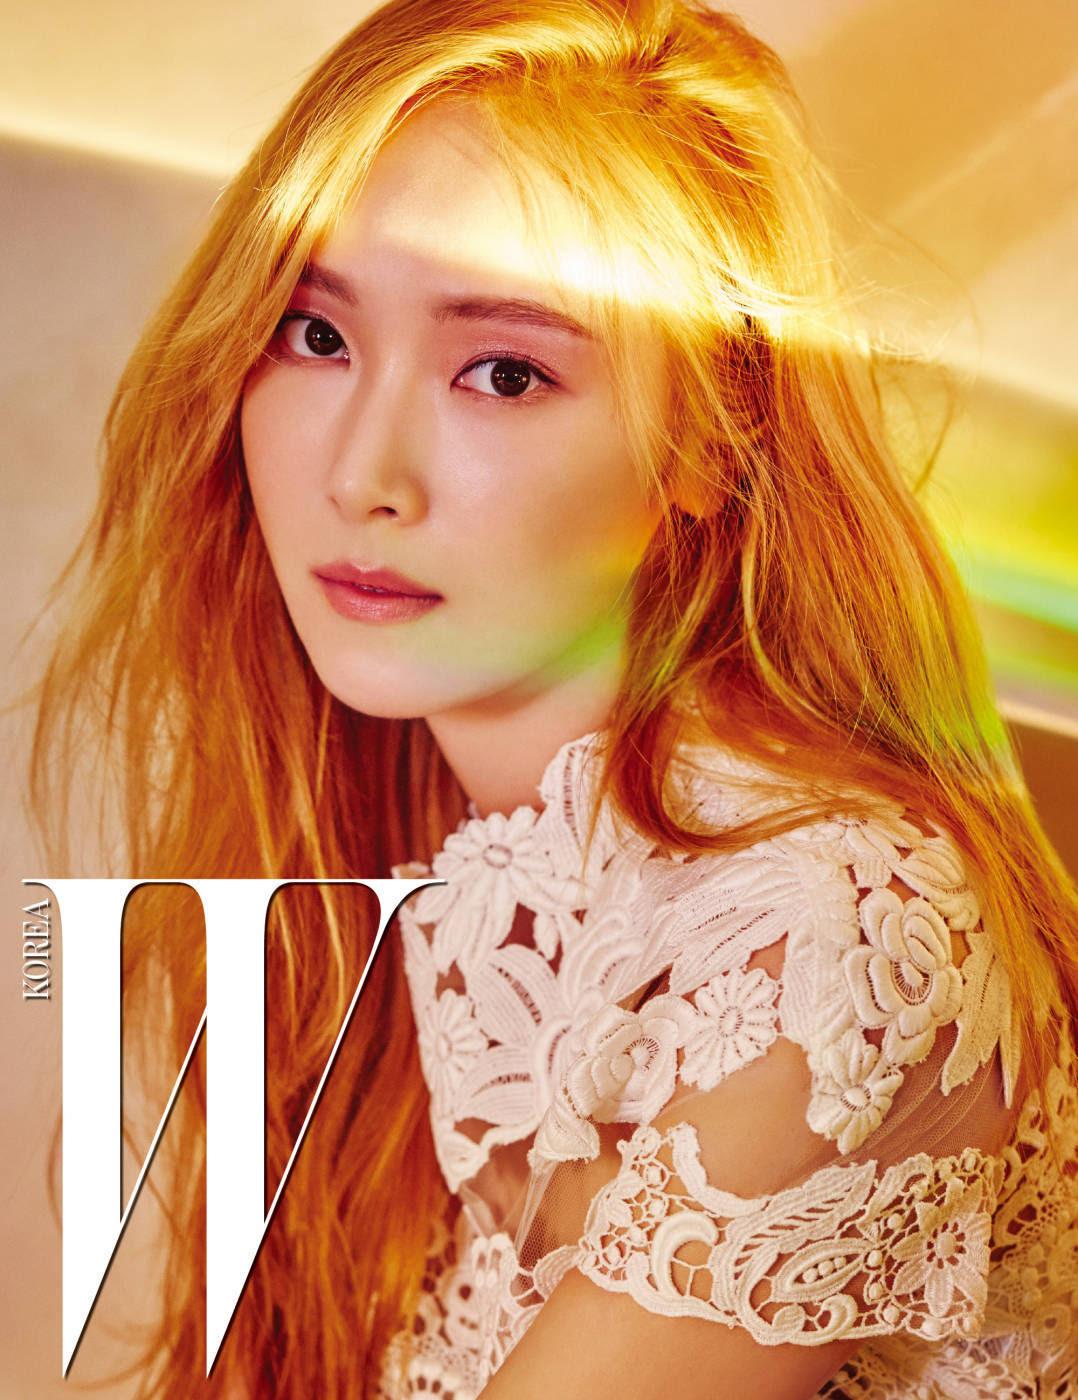 Jessica - W Magazine January Issue '17